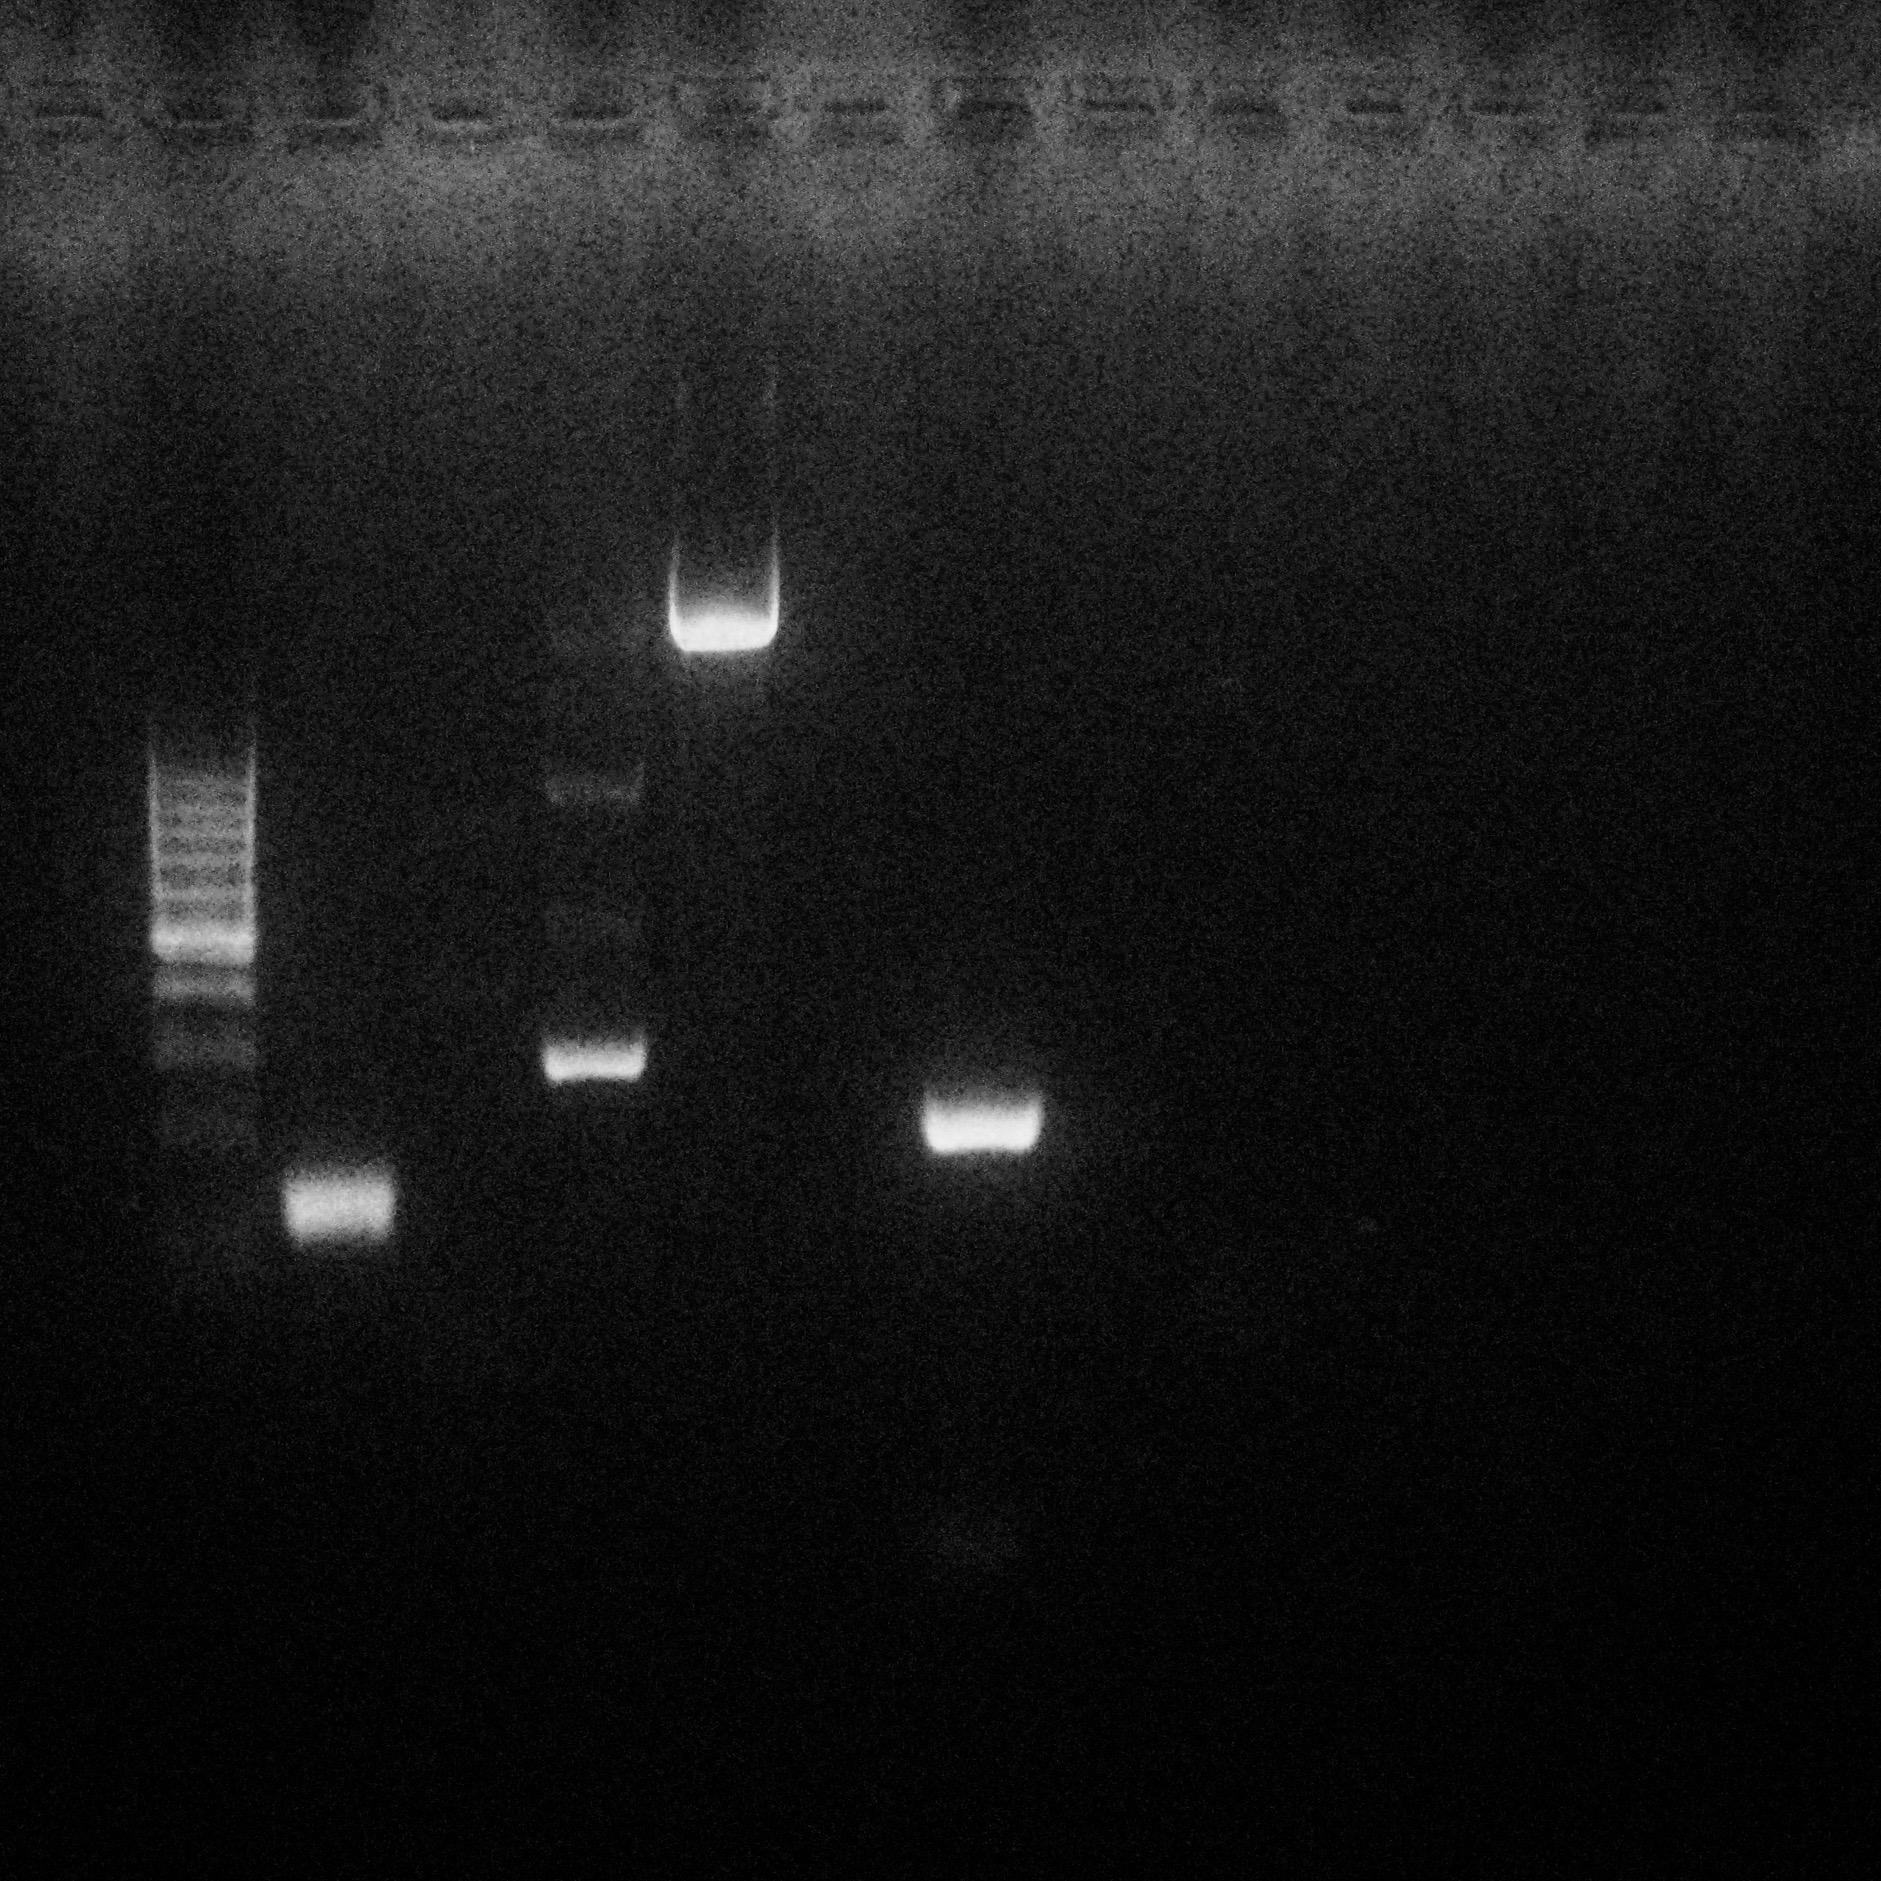 Test biologia molecolare